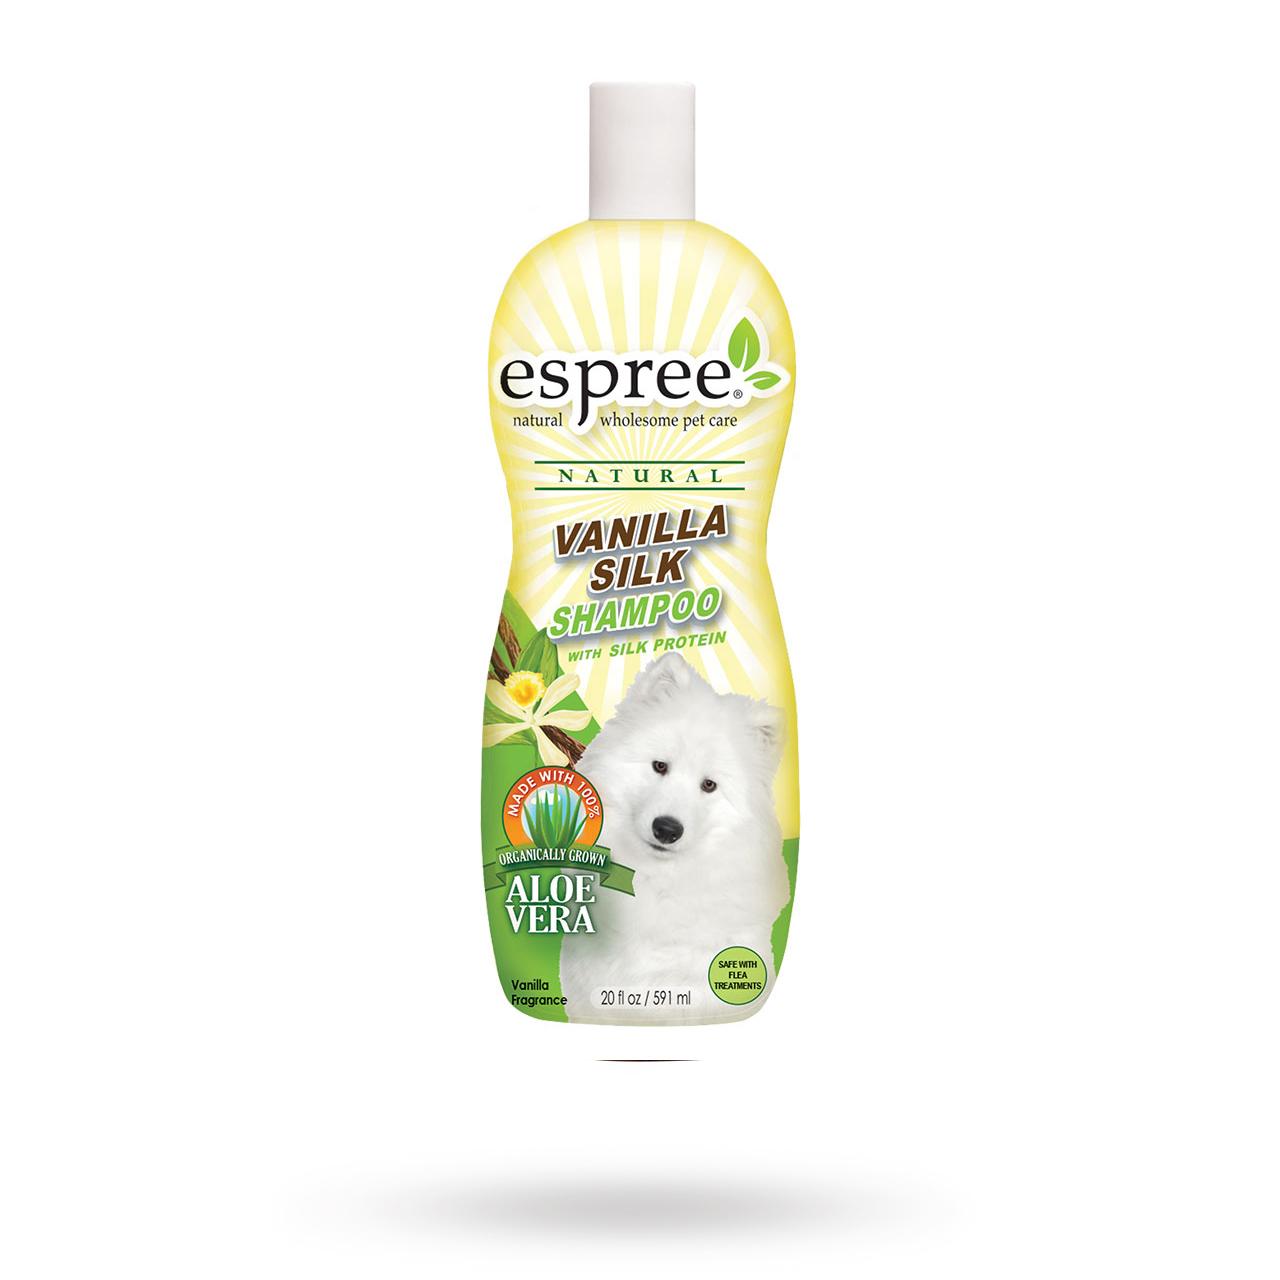 Espree Vanilla Silk Schampoo 355 ml